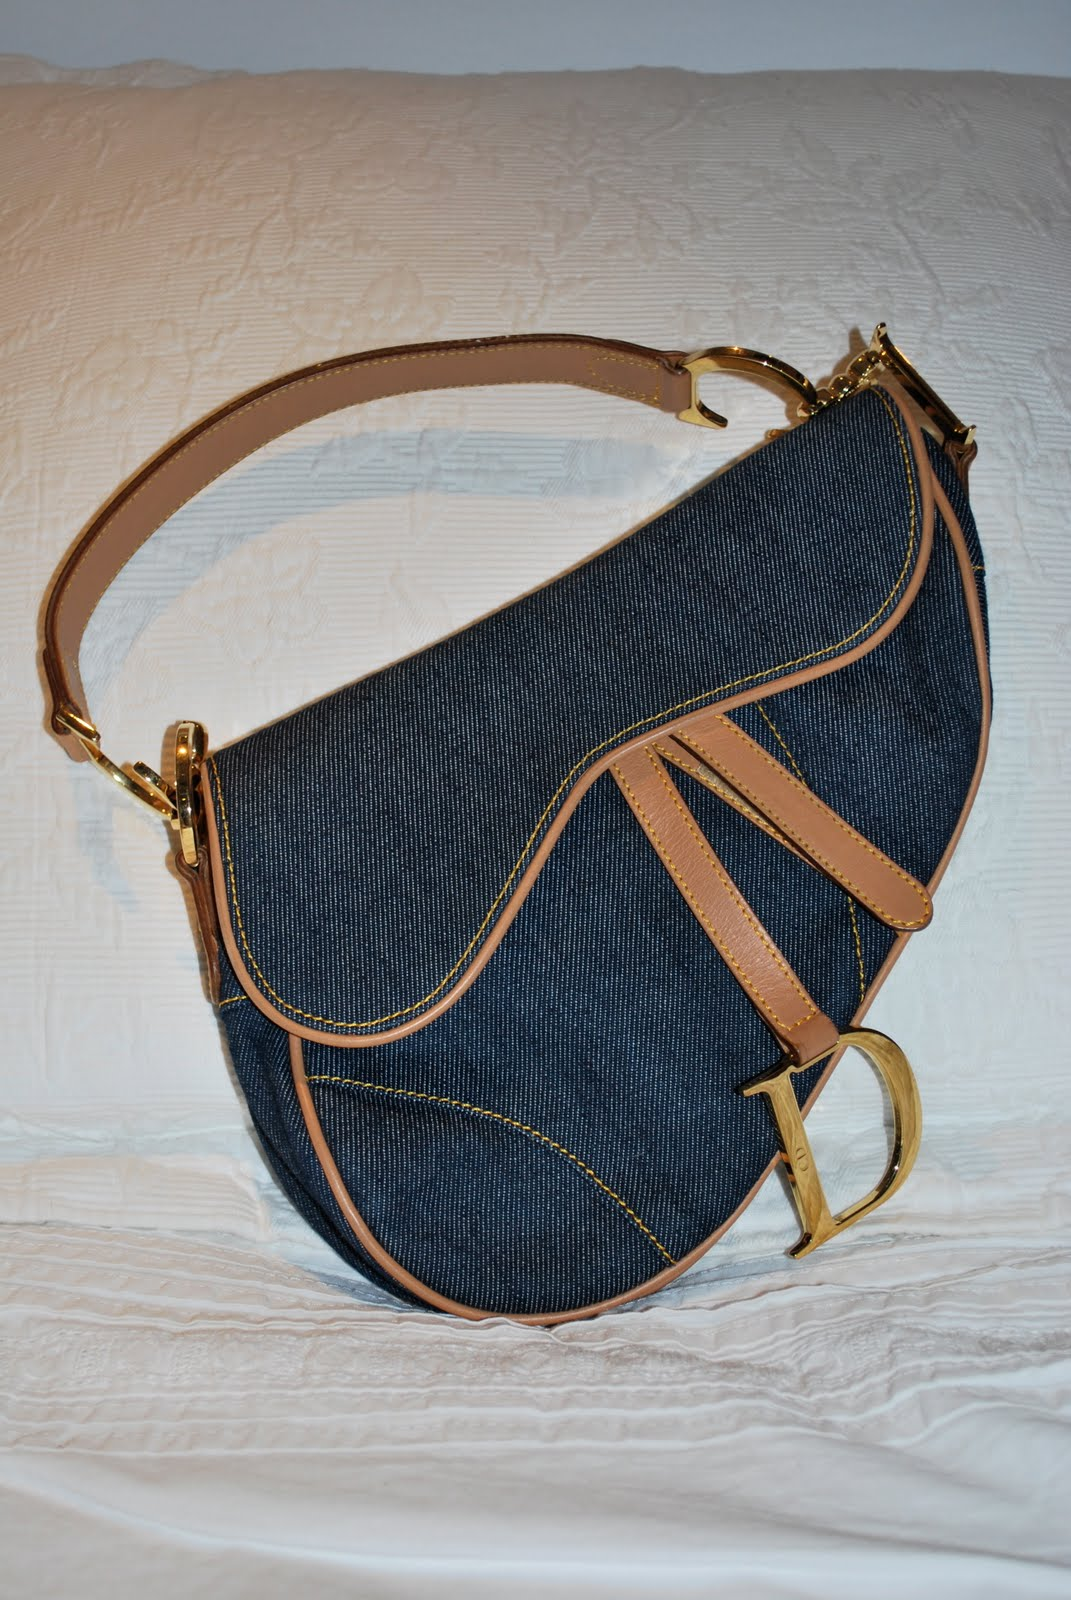 Authentic christian dior denim saddle bag bagalicious jpg 1071x1600 Authentic  christian dior saddle bag b3d8cf10f6744